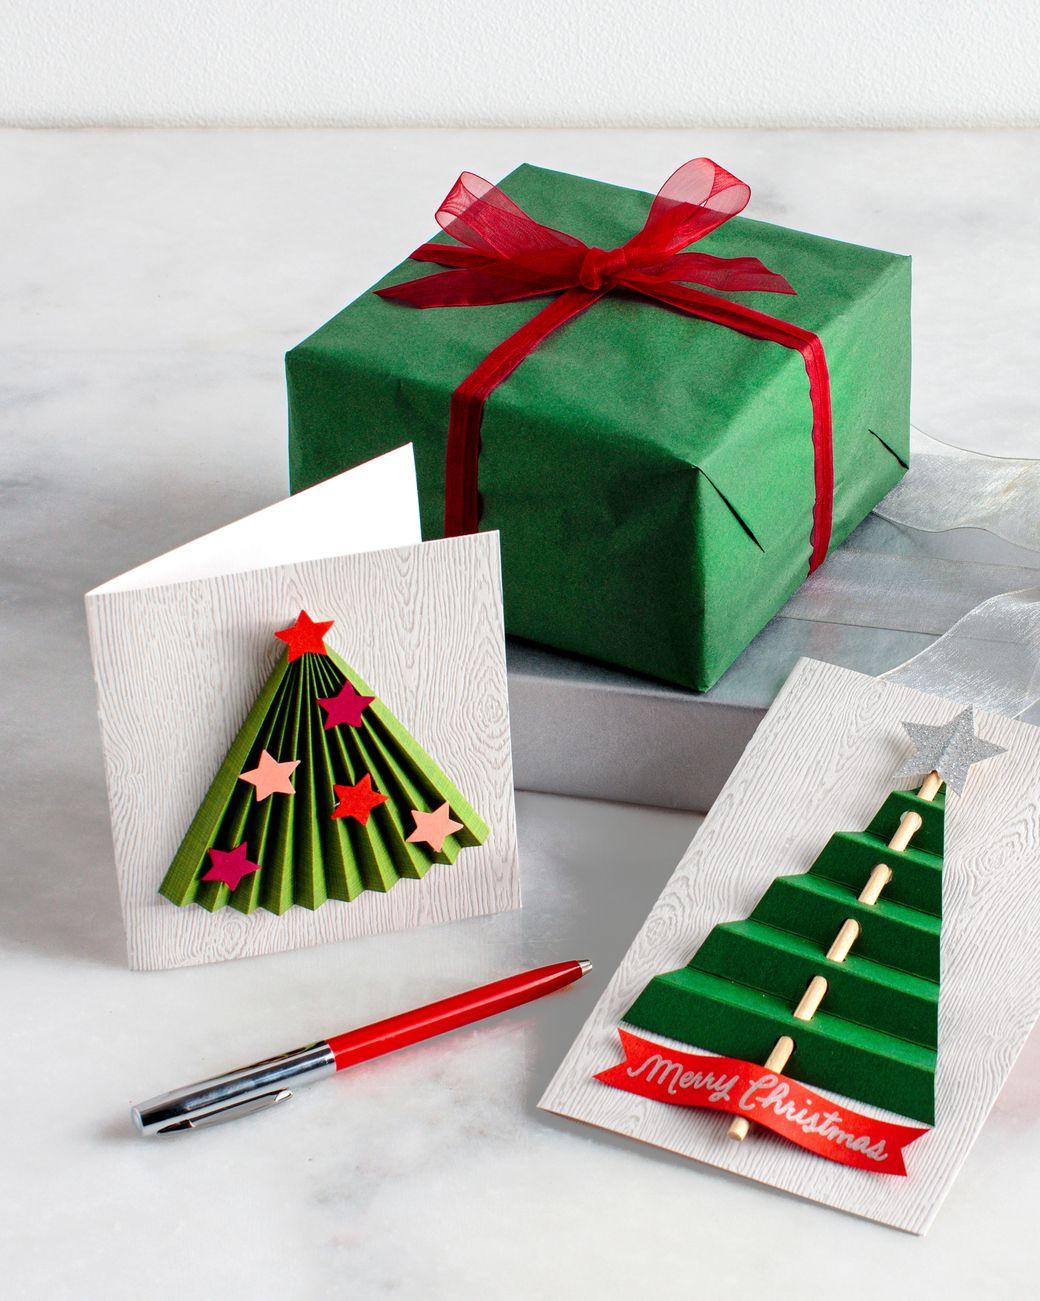 Weihnachtskarten selber machen: 4 DIY Ideen + Anleitung